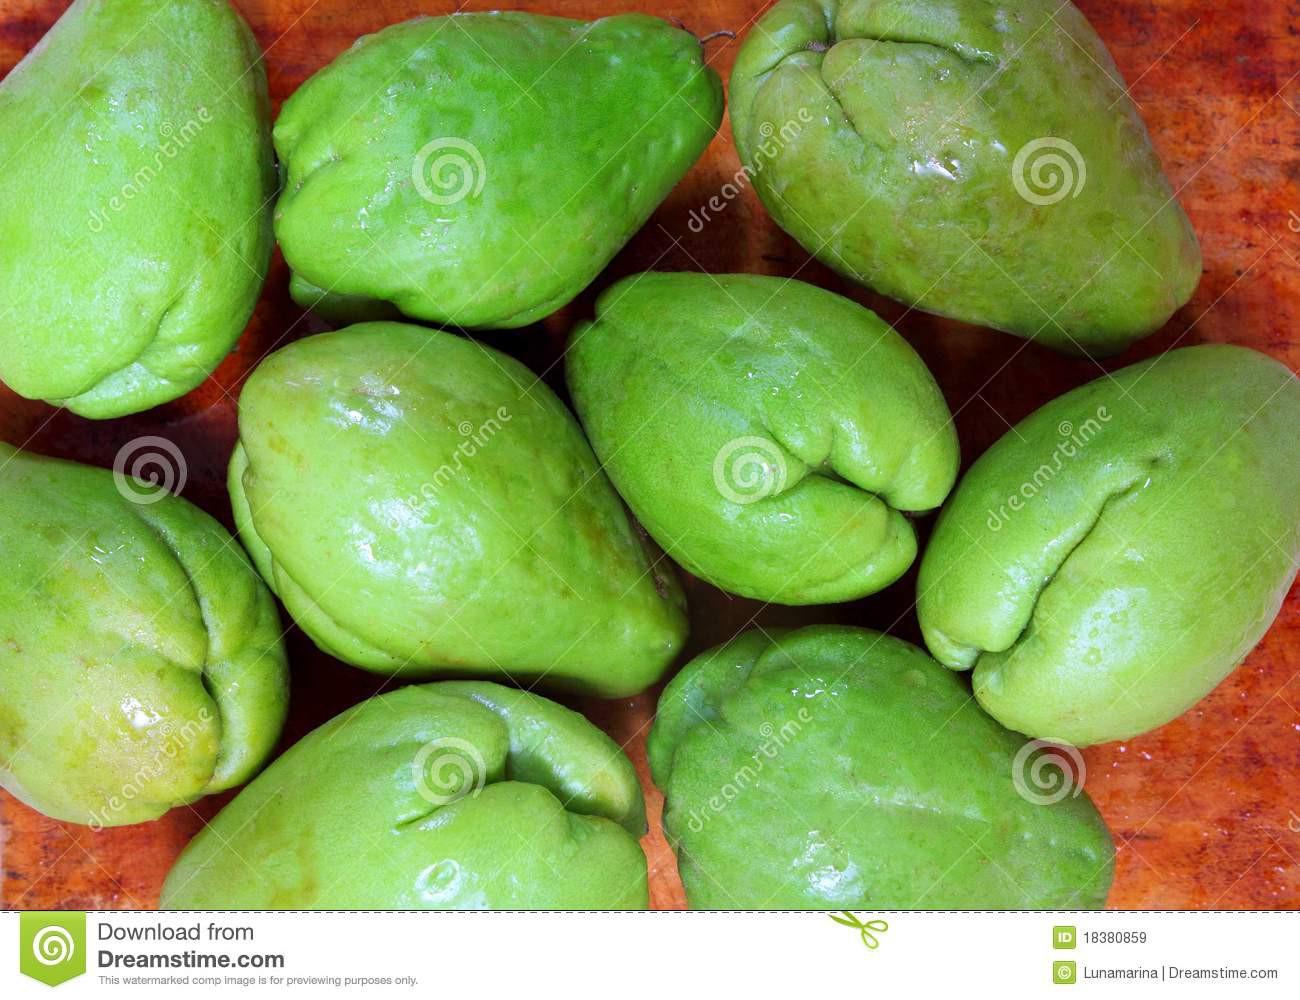 Squash Fruit Or Vegetable  Chayote Mango Squash Mirliton Ve able Stock Image